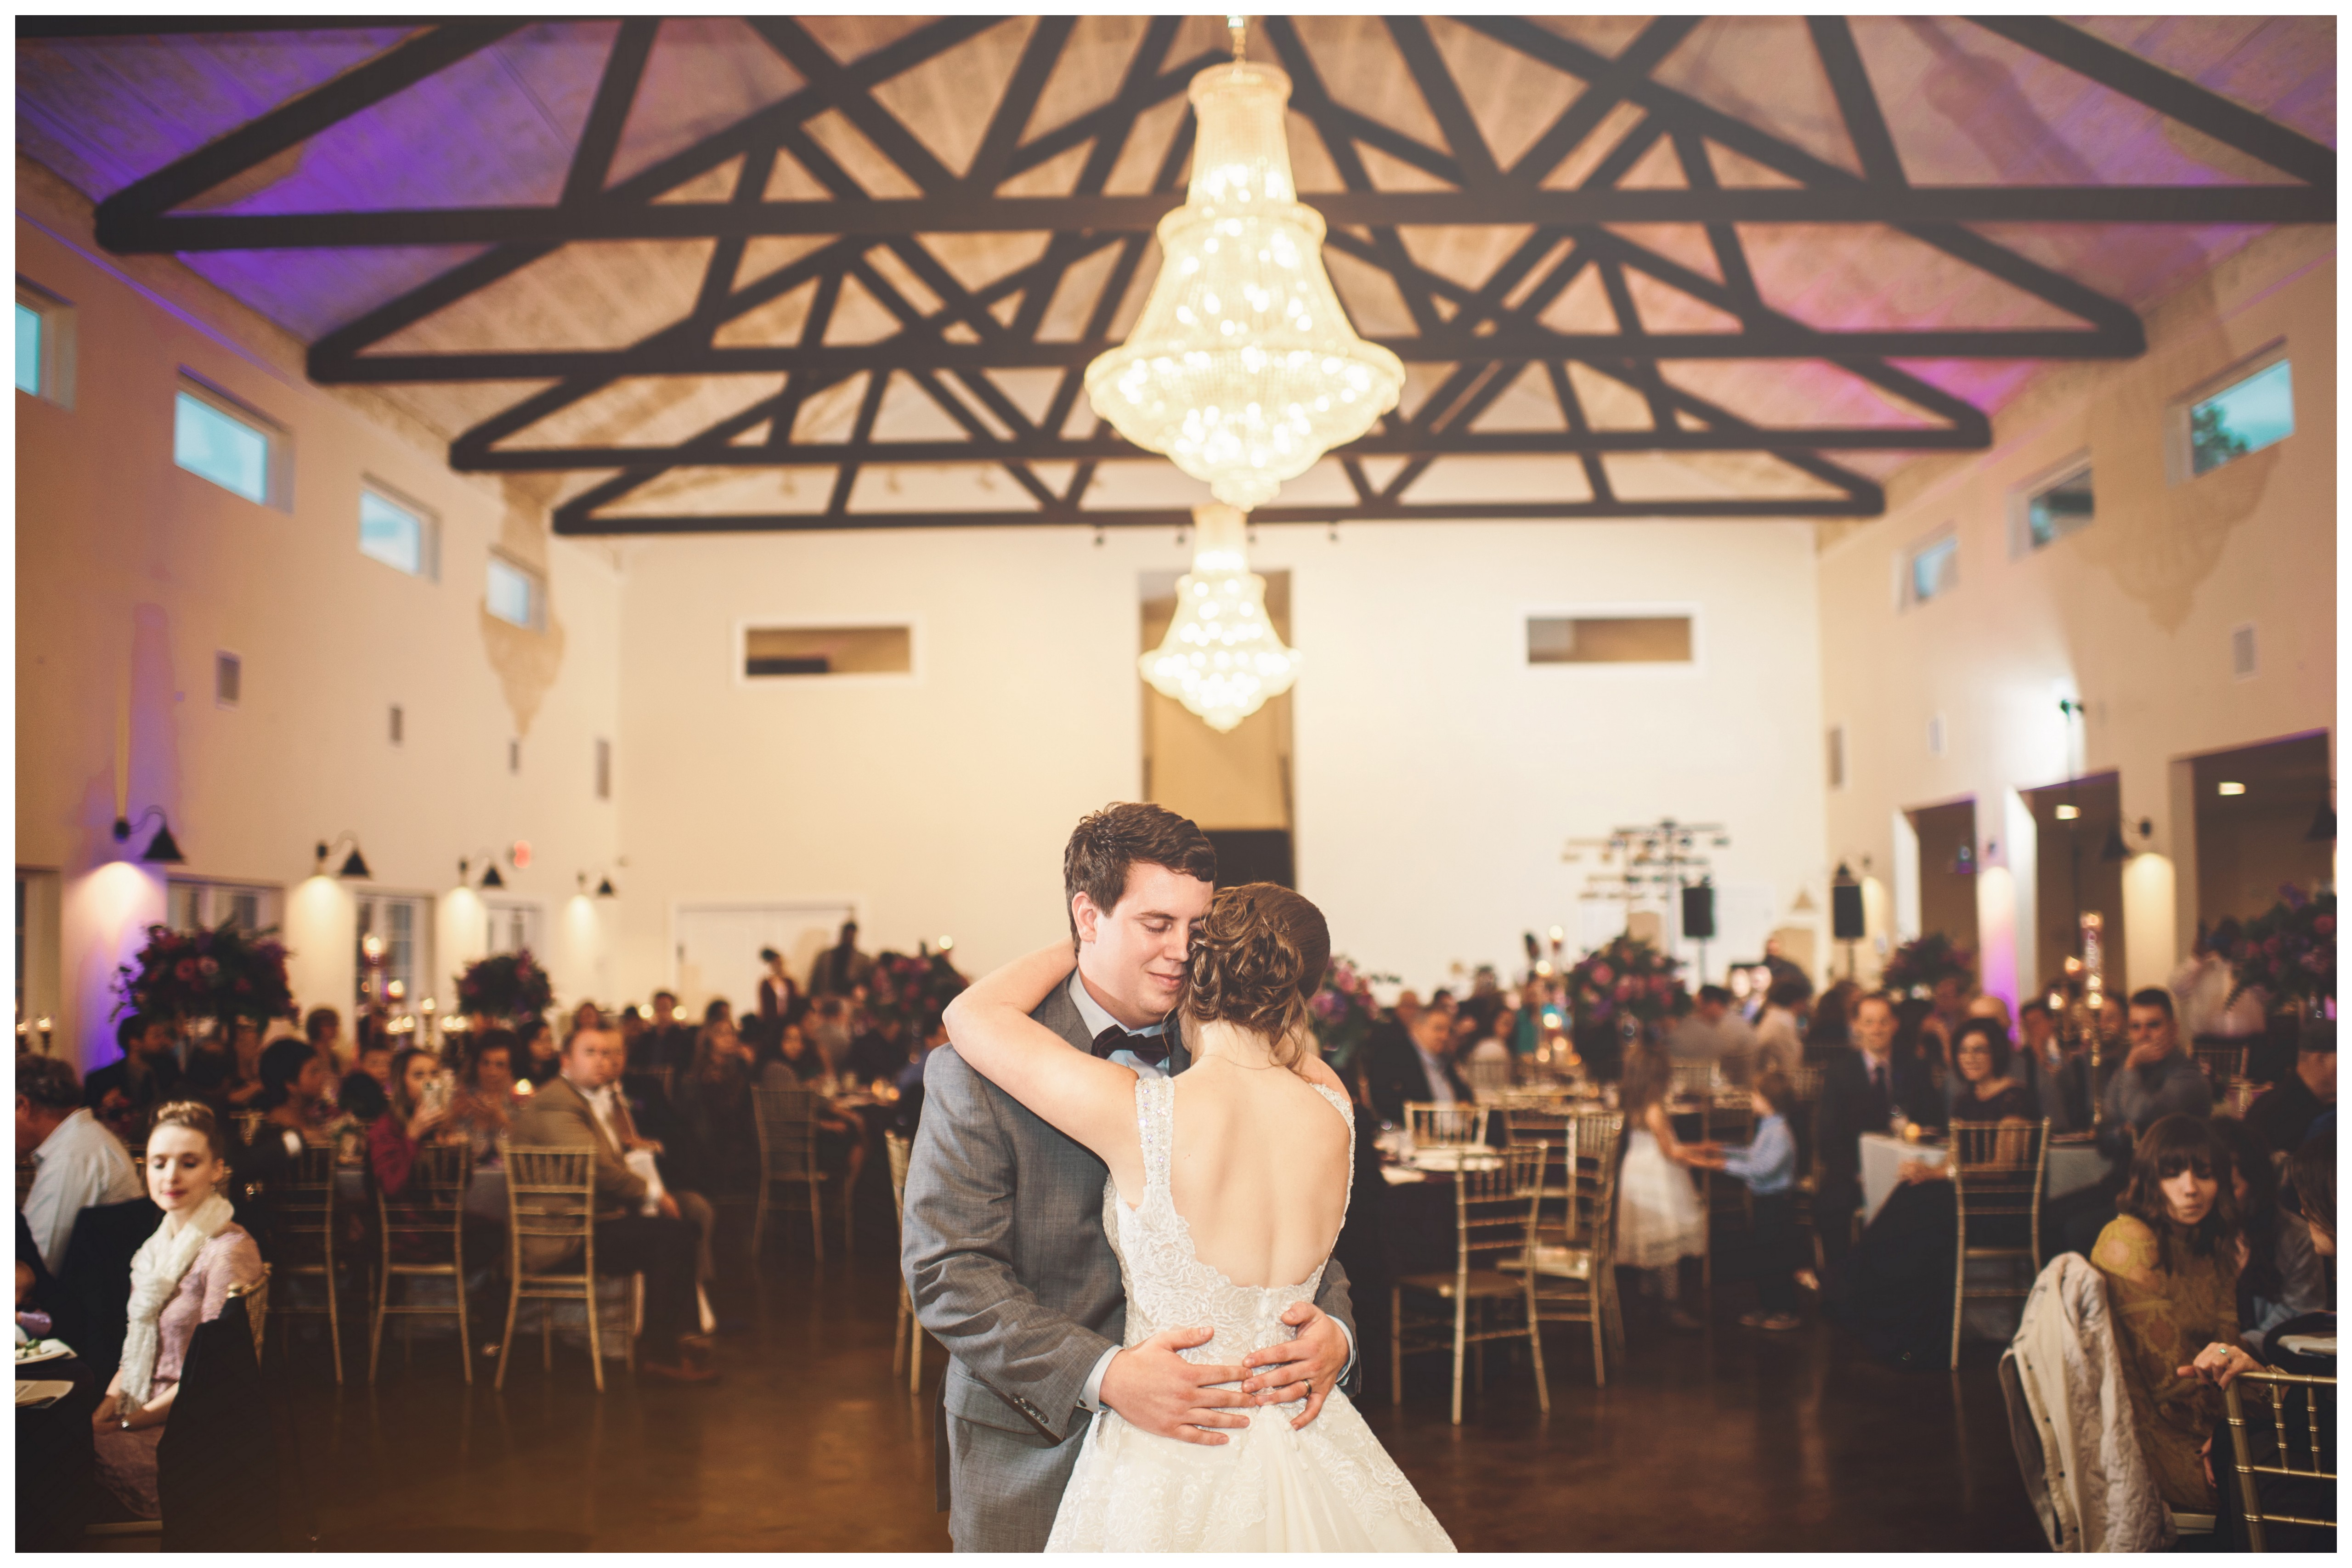 LIVE_FINAL_WEDDING_WESLEY_SARAH_JO7